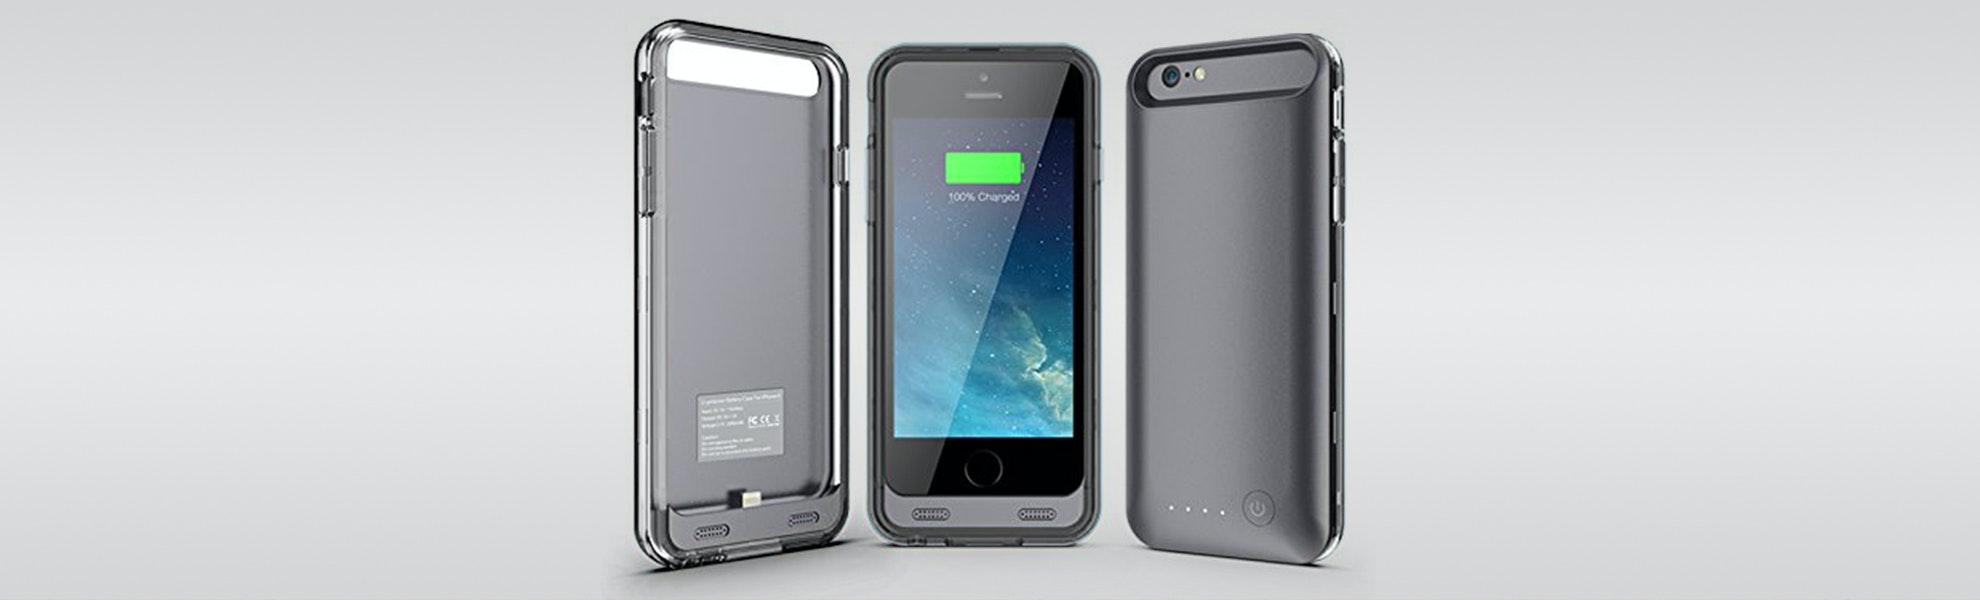 Urge Basics ArmorLite iPhone 6 Battery Case Black